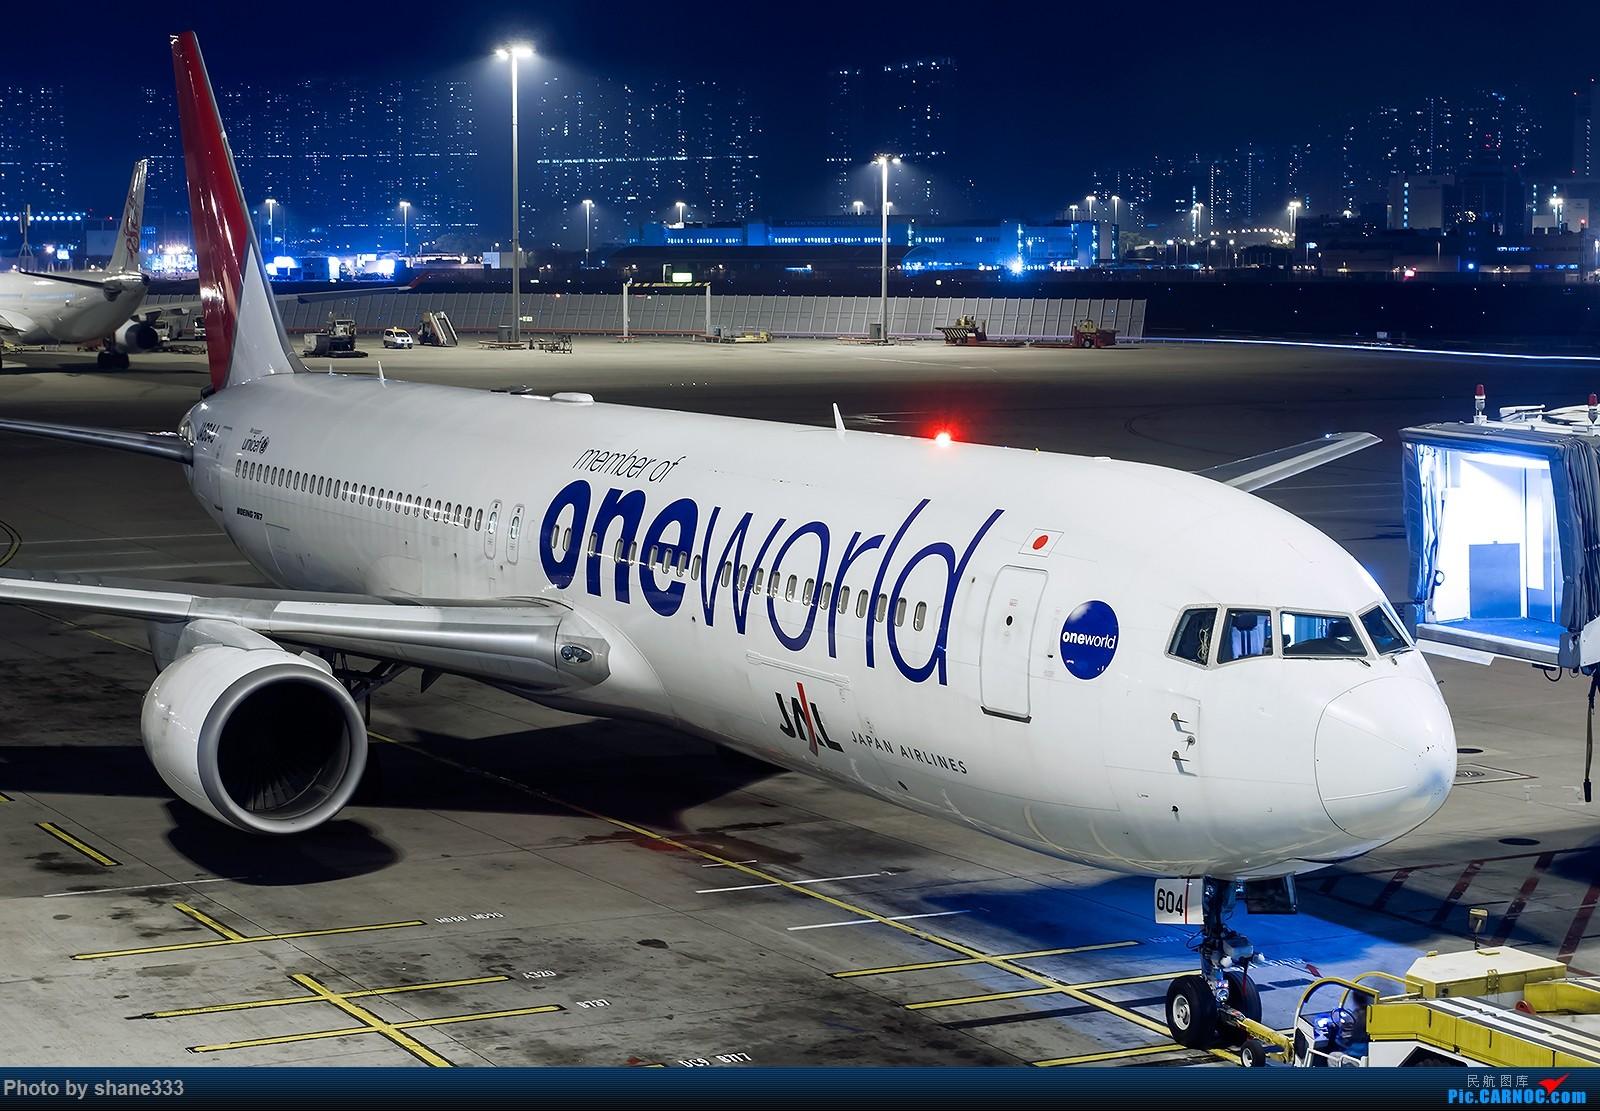 Re:[原创]夜太美 BOEING 767-300 JA604J 中国香港赤鱲角国际机场